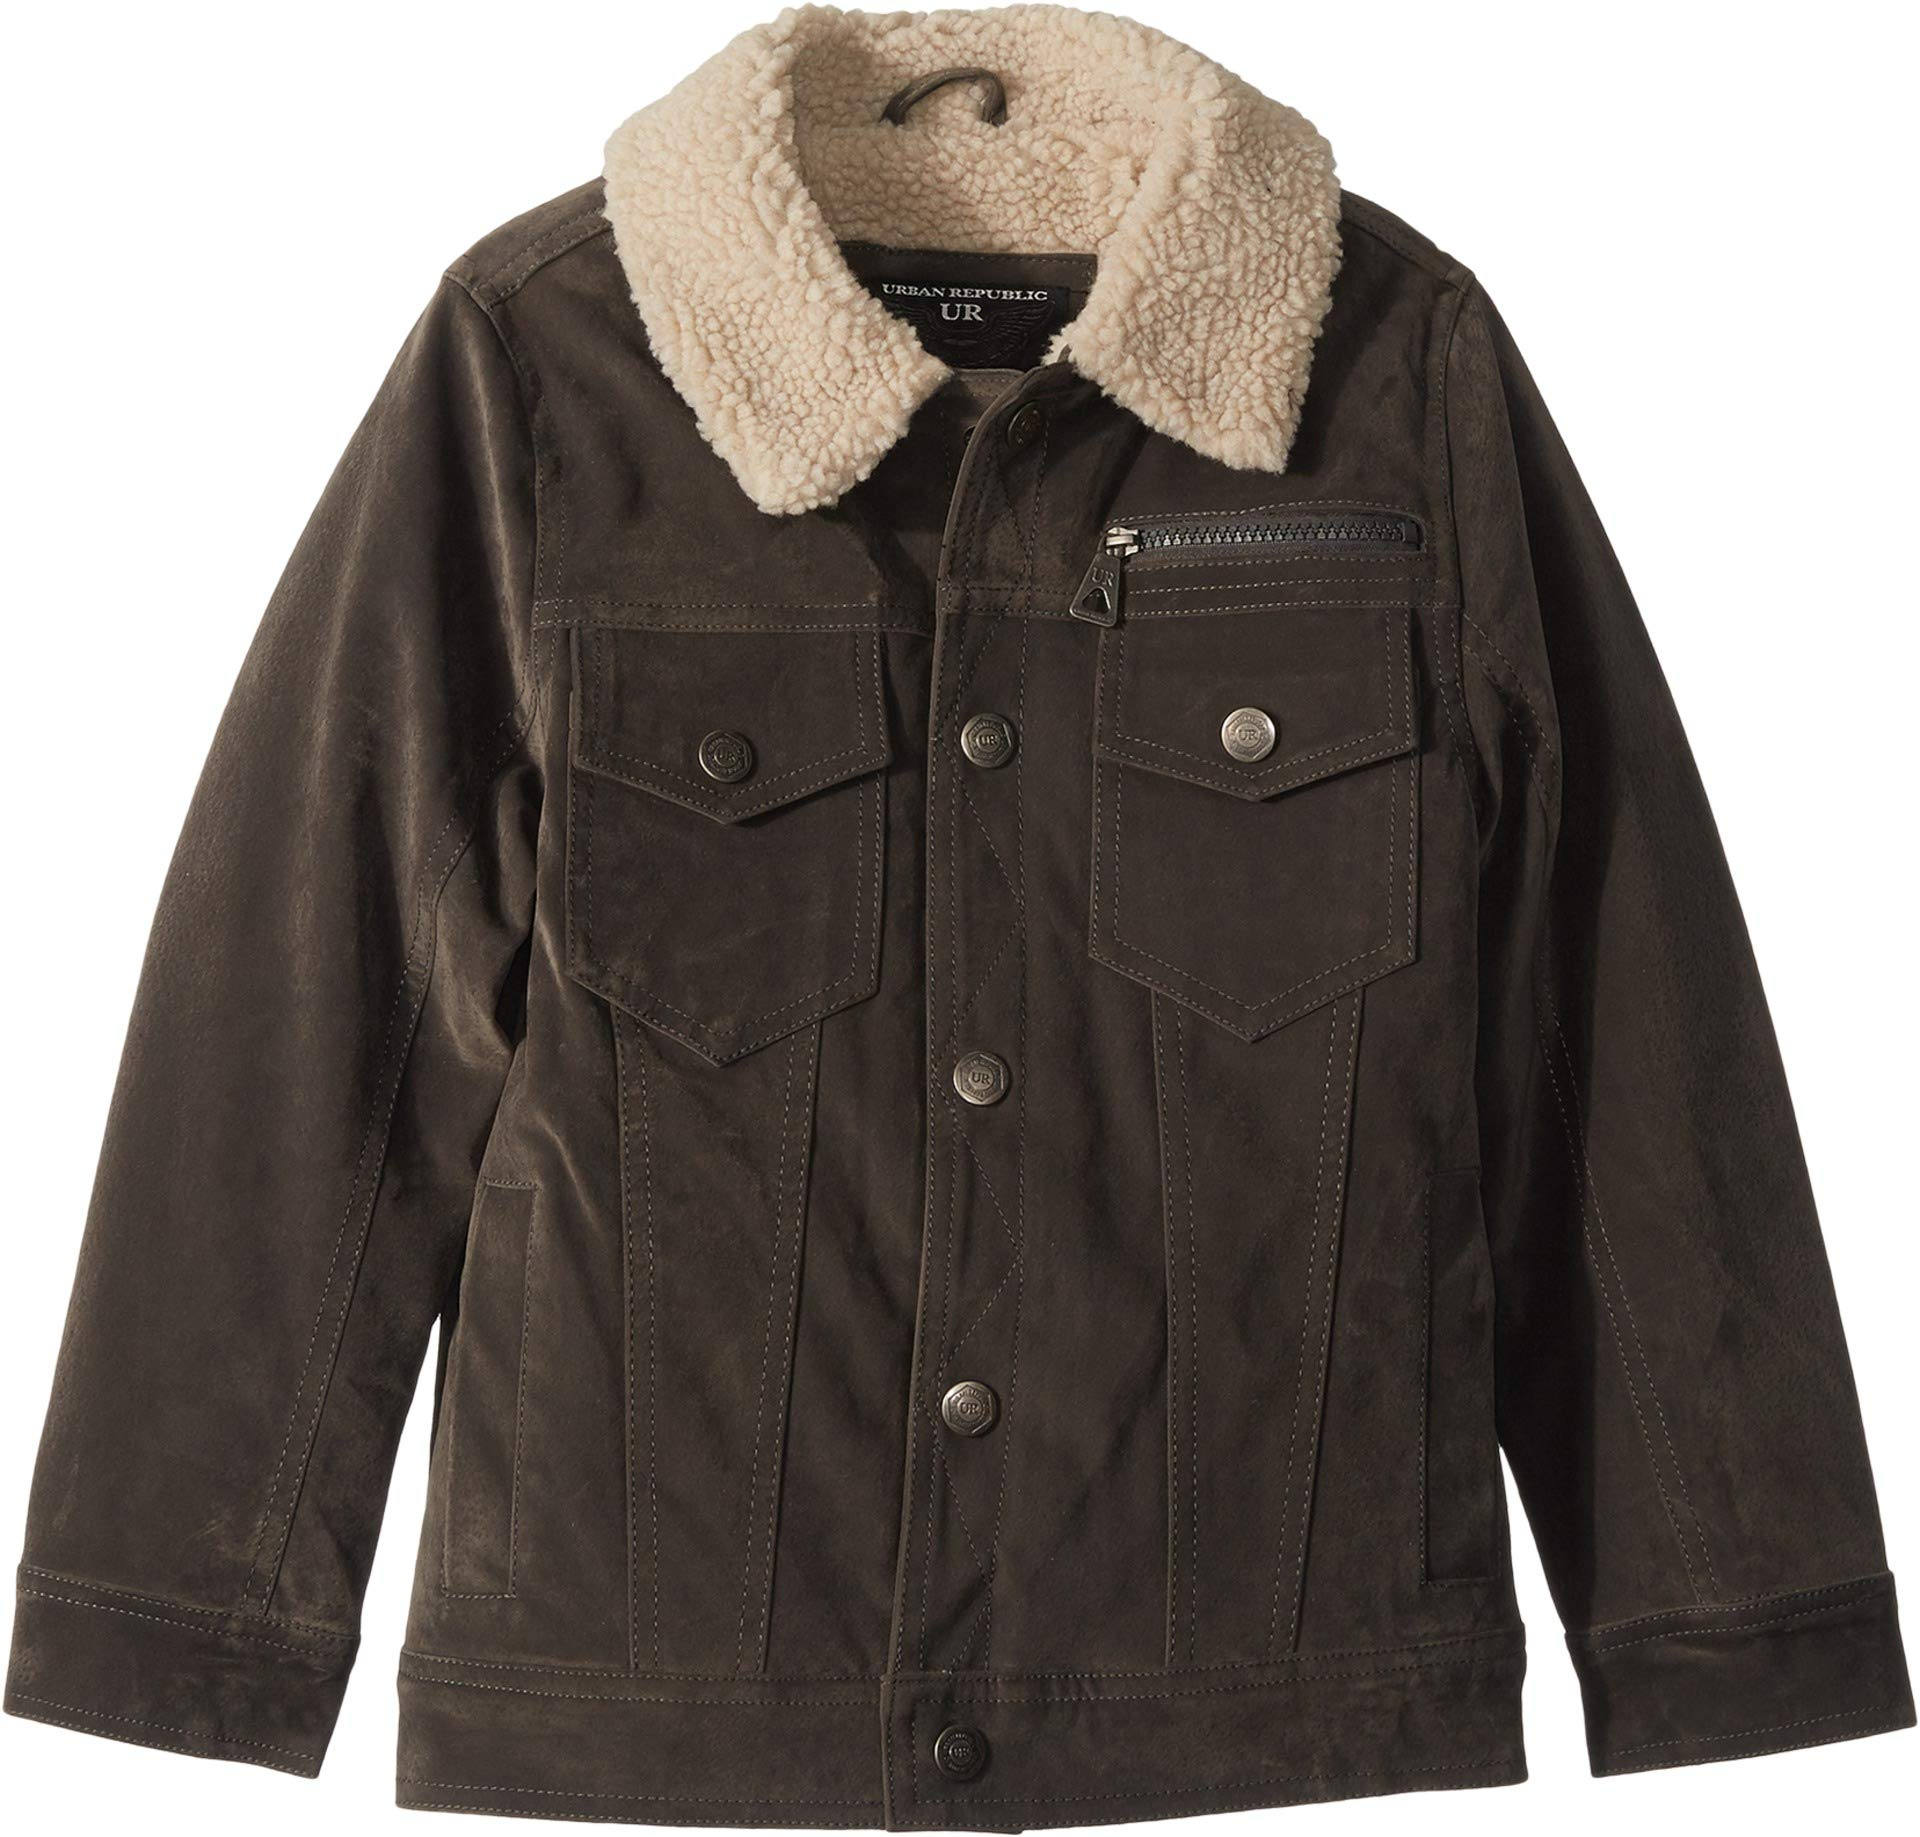 Urban Republic Kids Boy's James PU Suede Sherpa Lined Five-Pocket Jacket (Little Kids/Big Kids) Charcoal 5-6